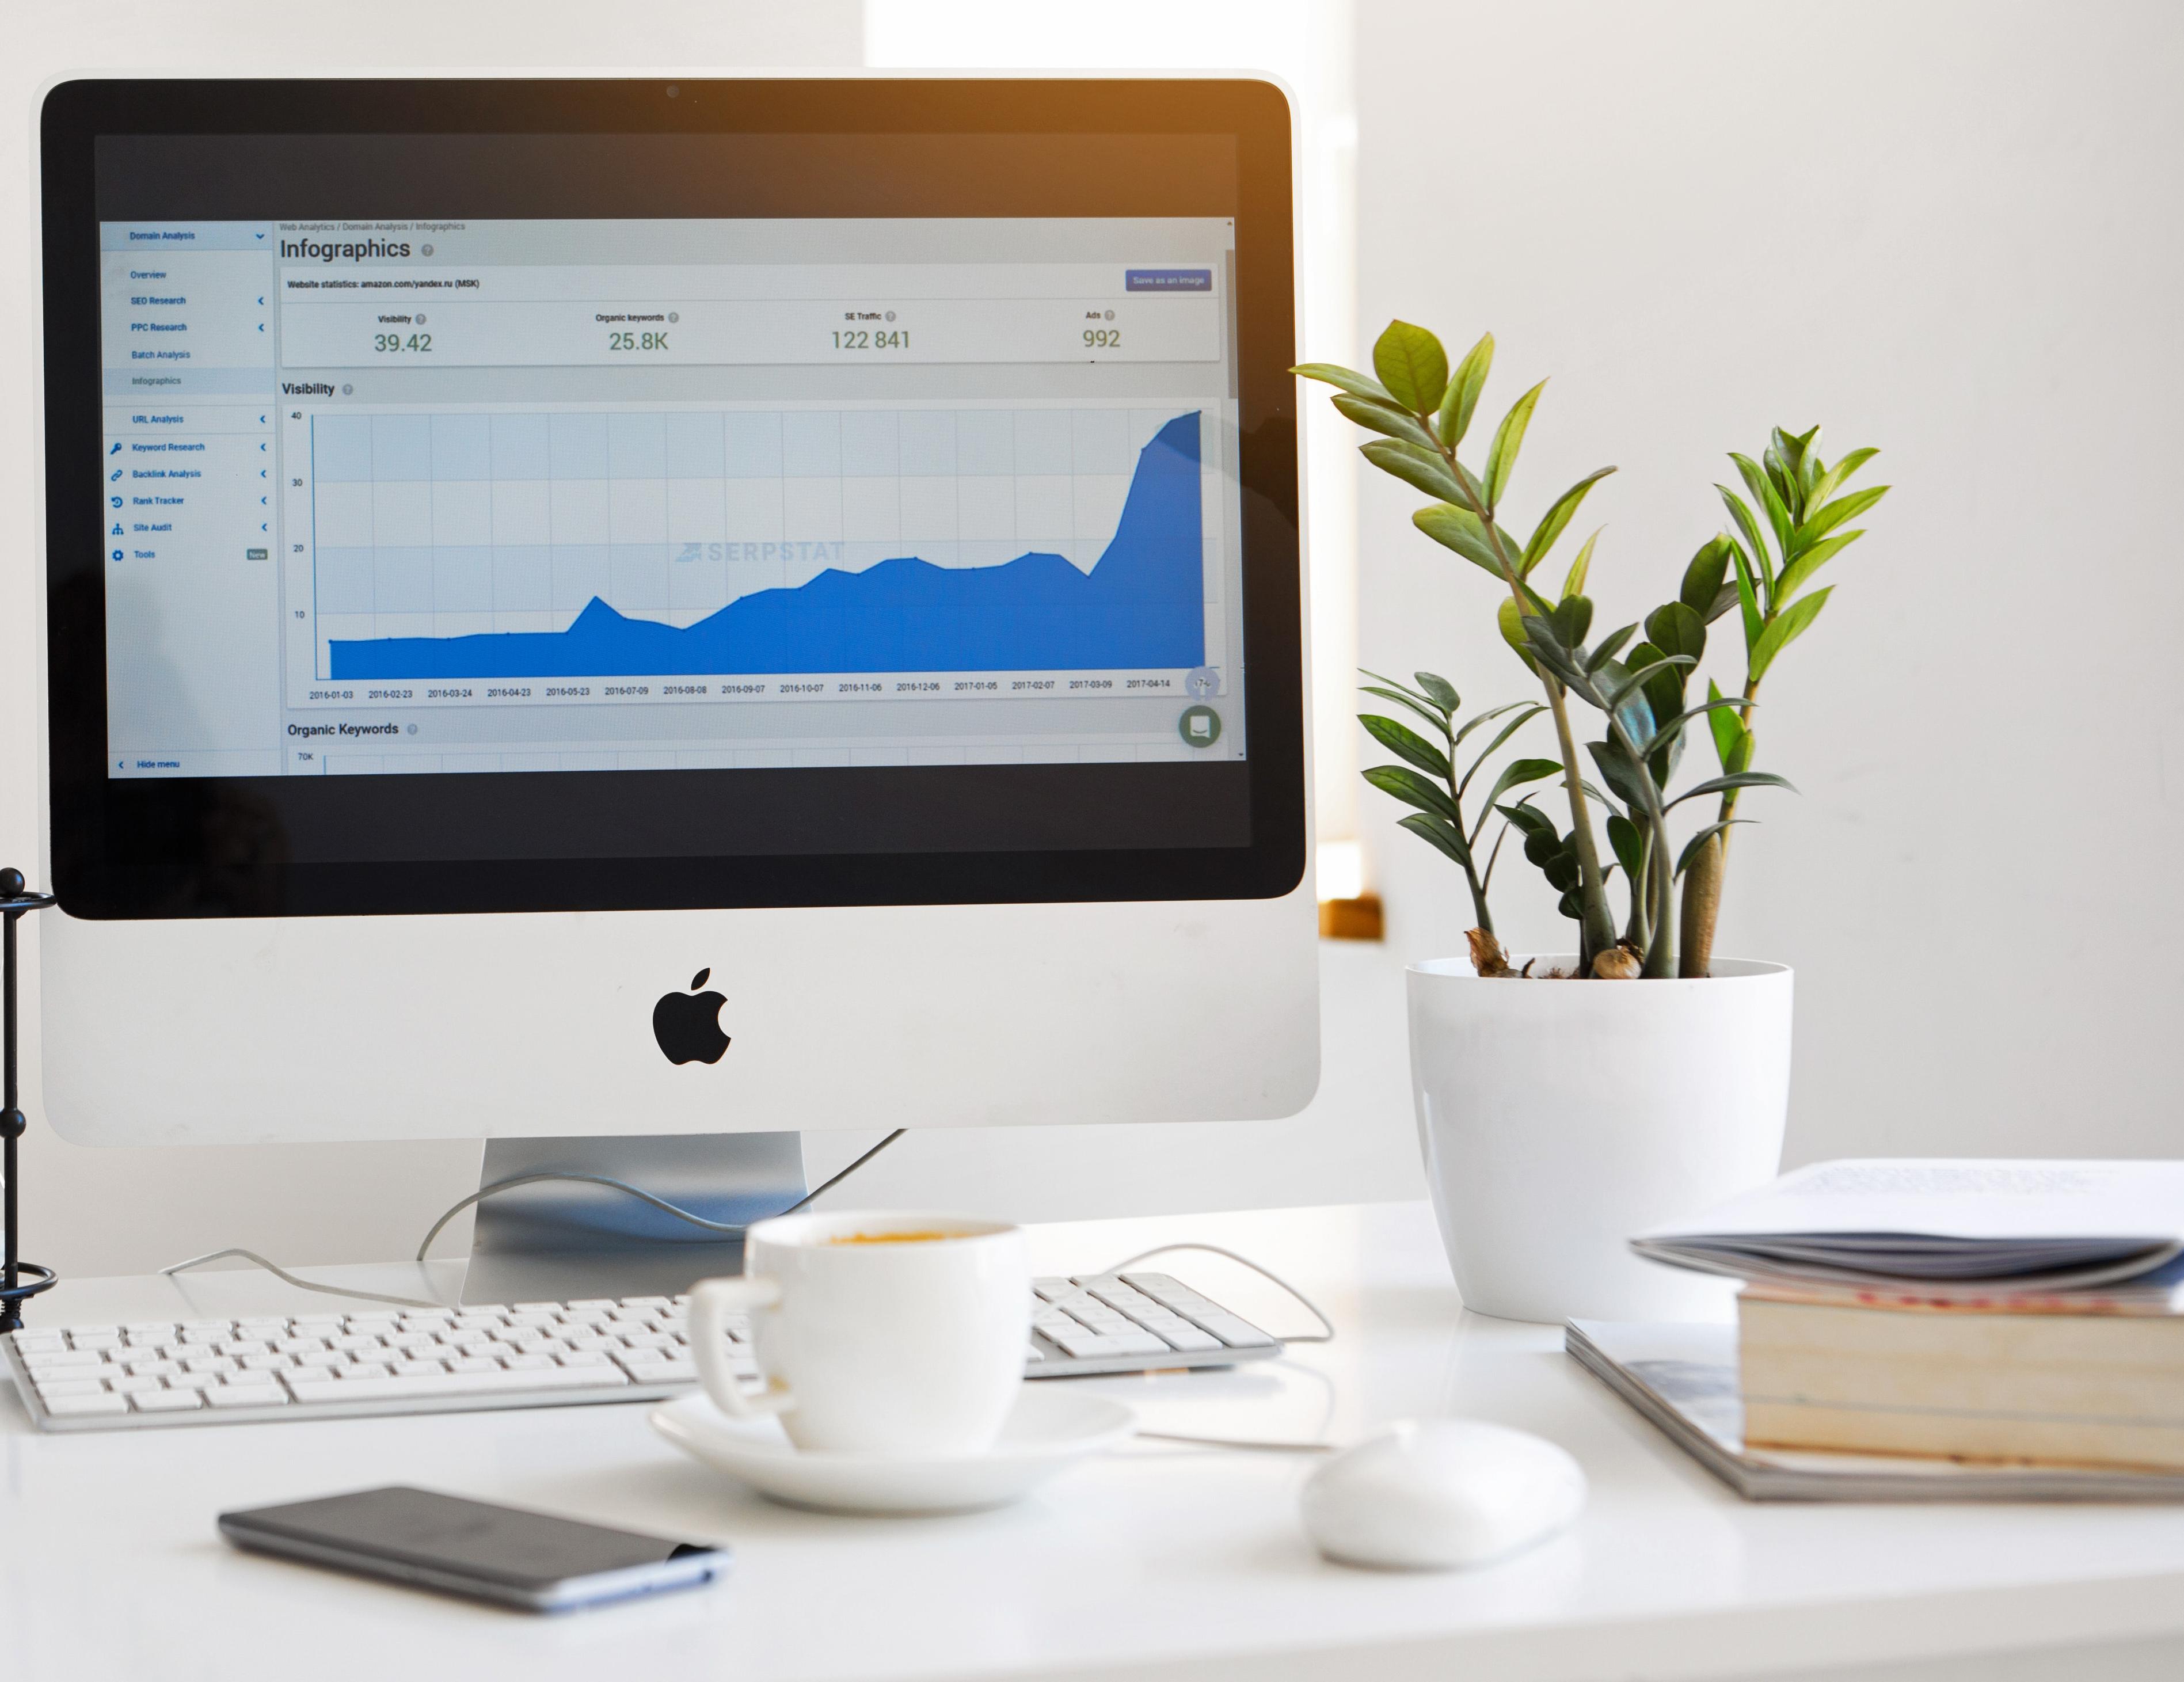 optimize-and-analyze